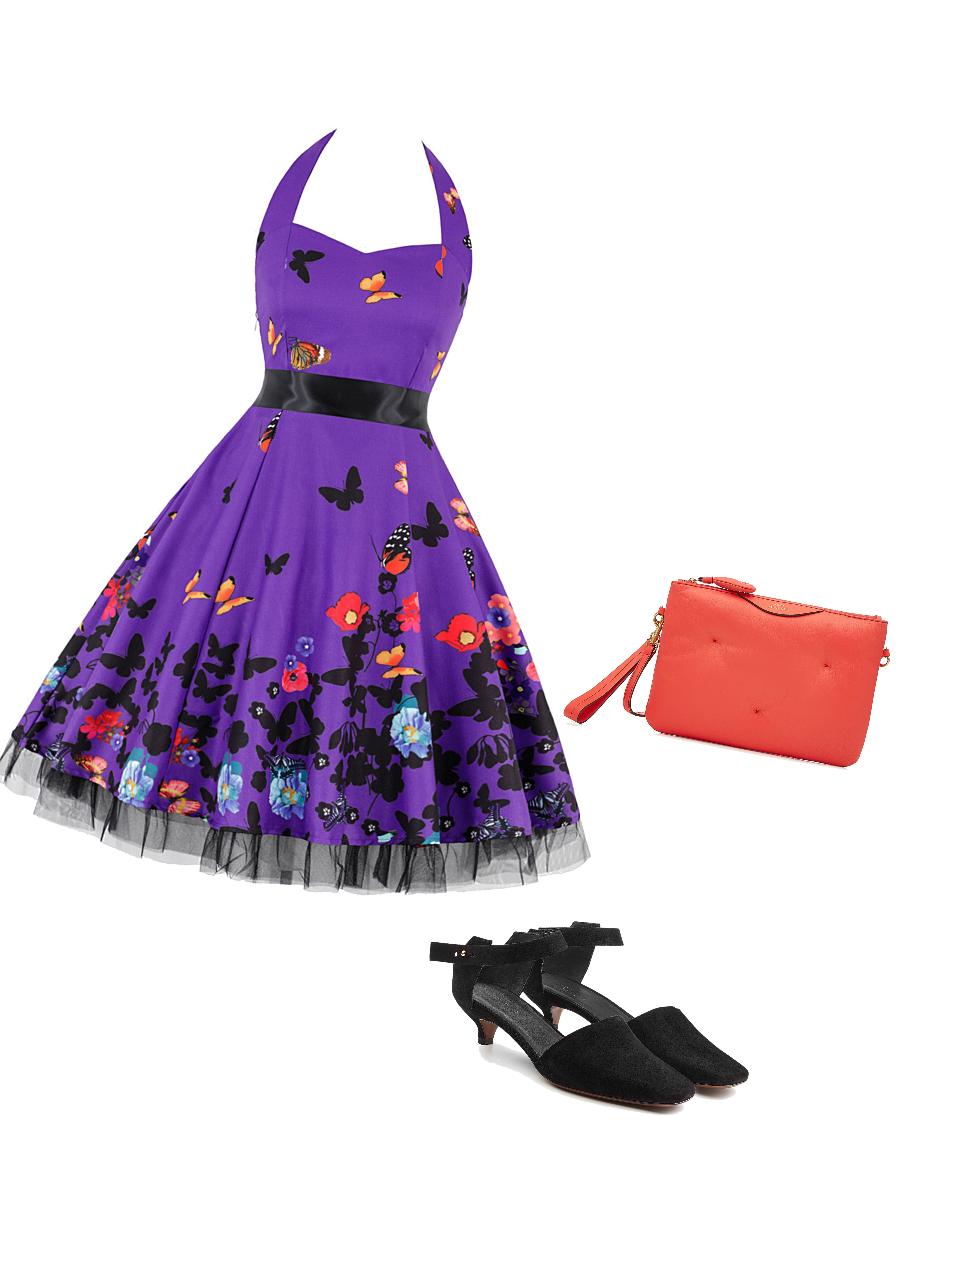 Purple, black, and orange